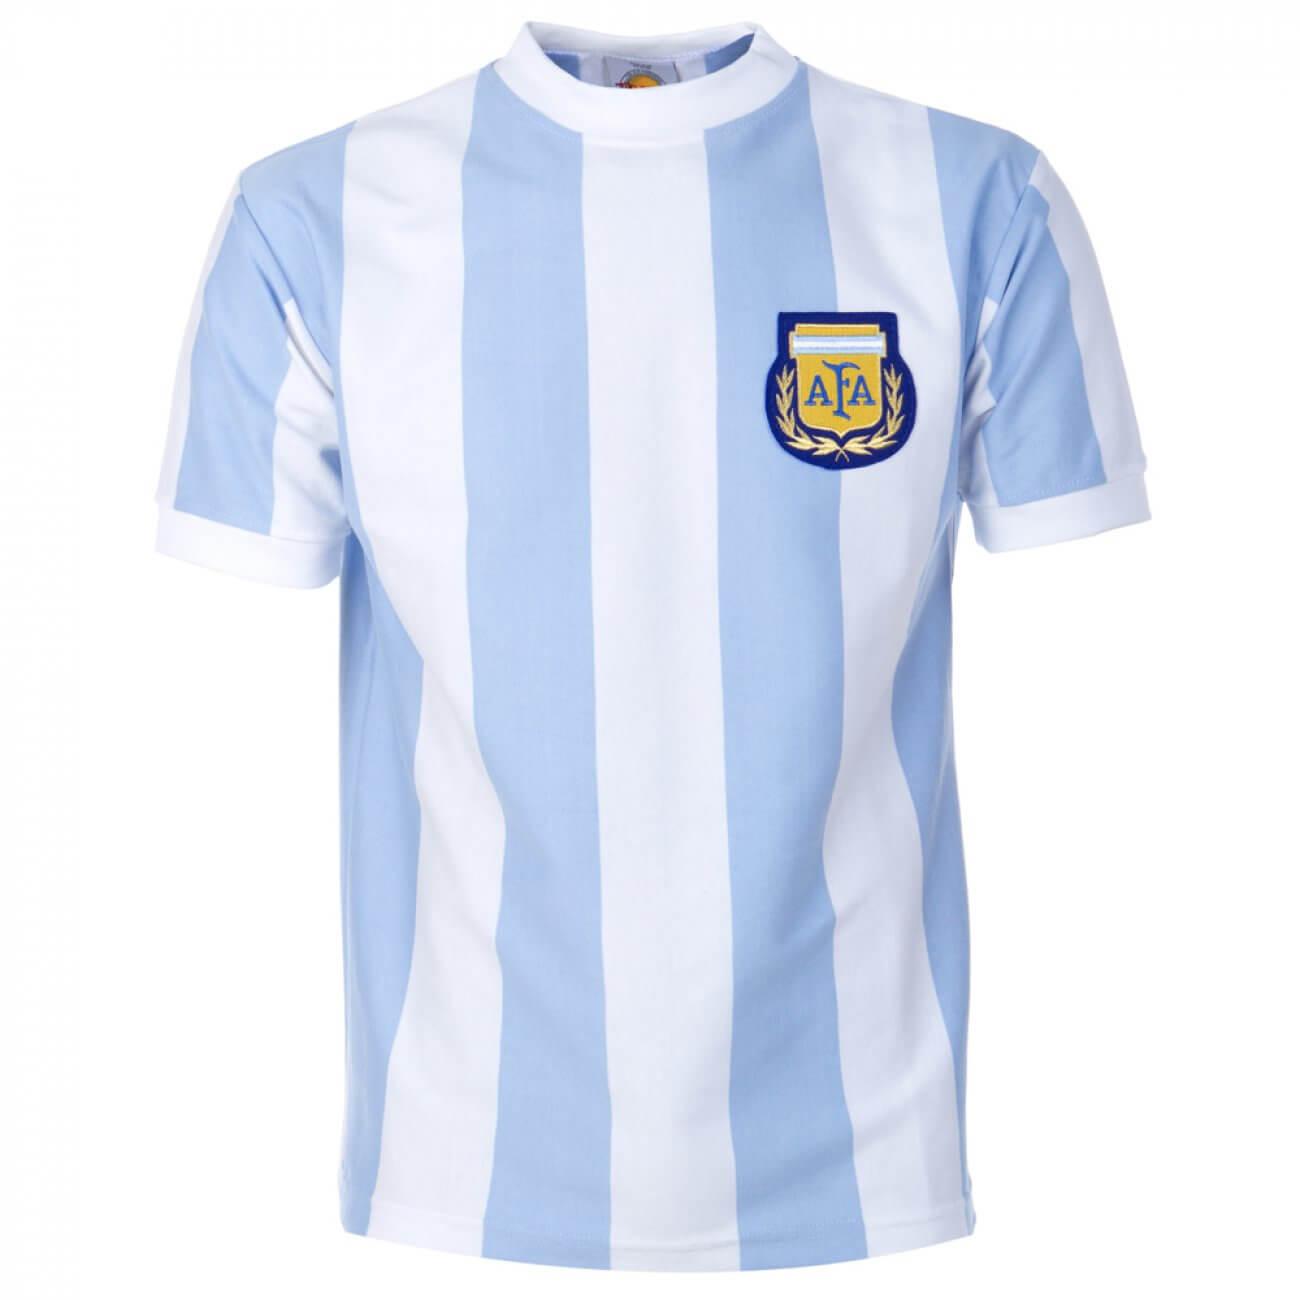 Camiseta Maradona Argentina 1986